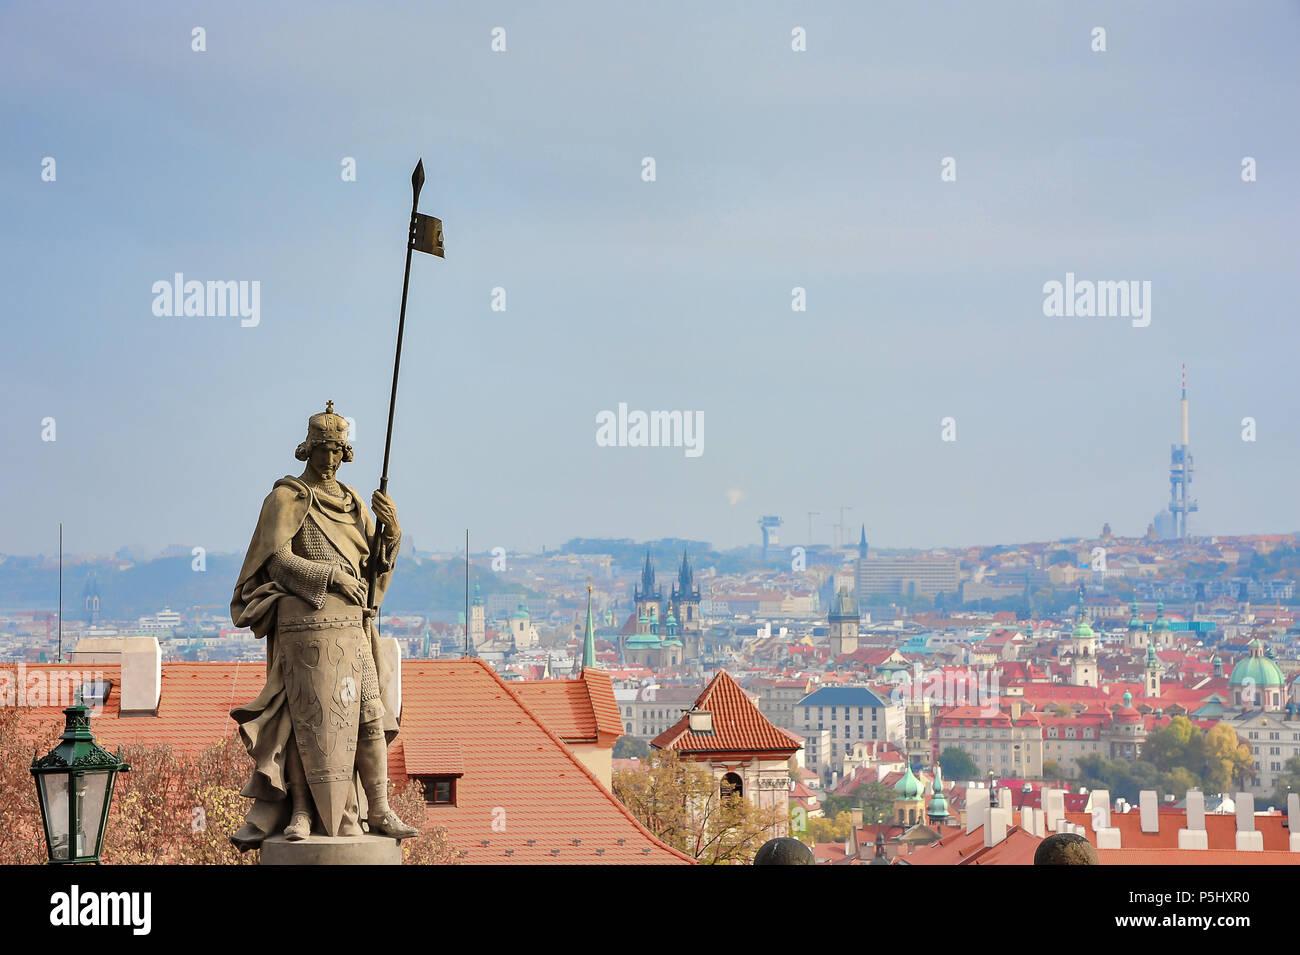 St. Wenceslas statue overlooks Prague city. Sculpture by Cenek Vosmik in Hradcany Square at Prague Castle. Saint with shield and spear against skyline - Stock Image